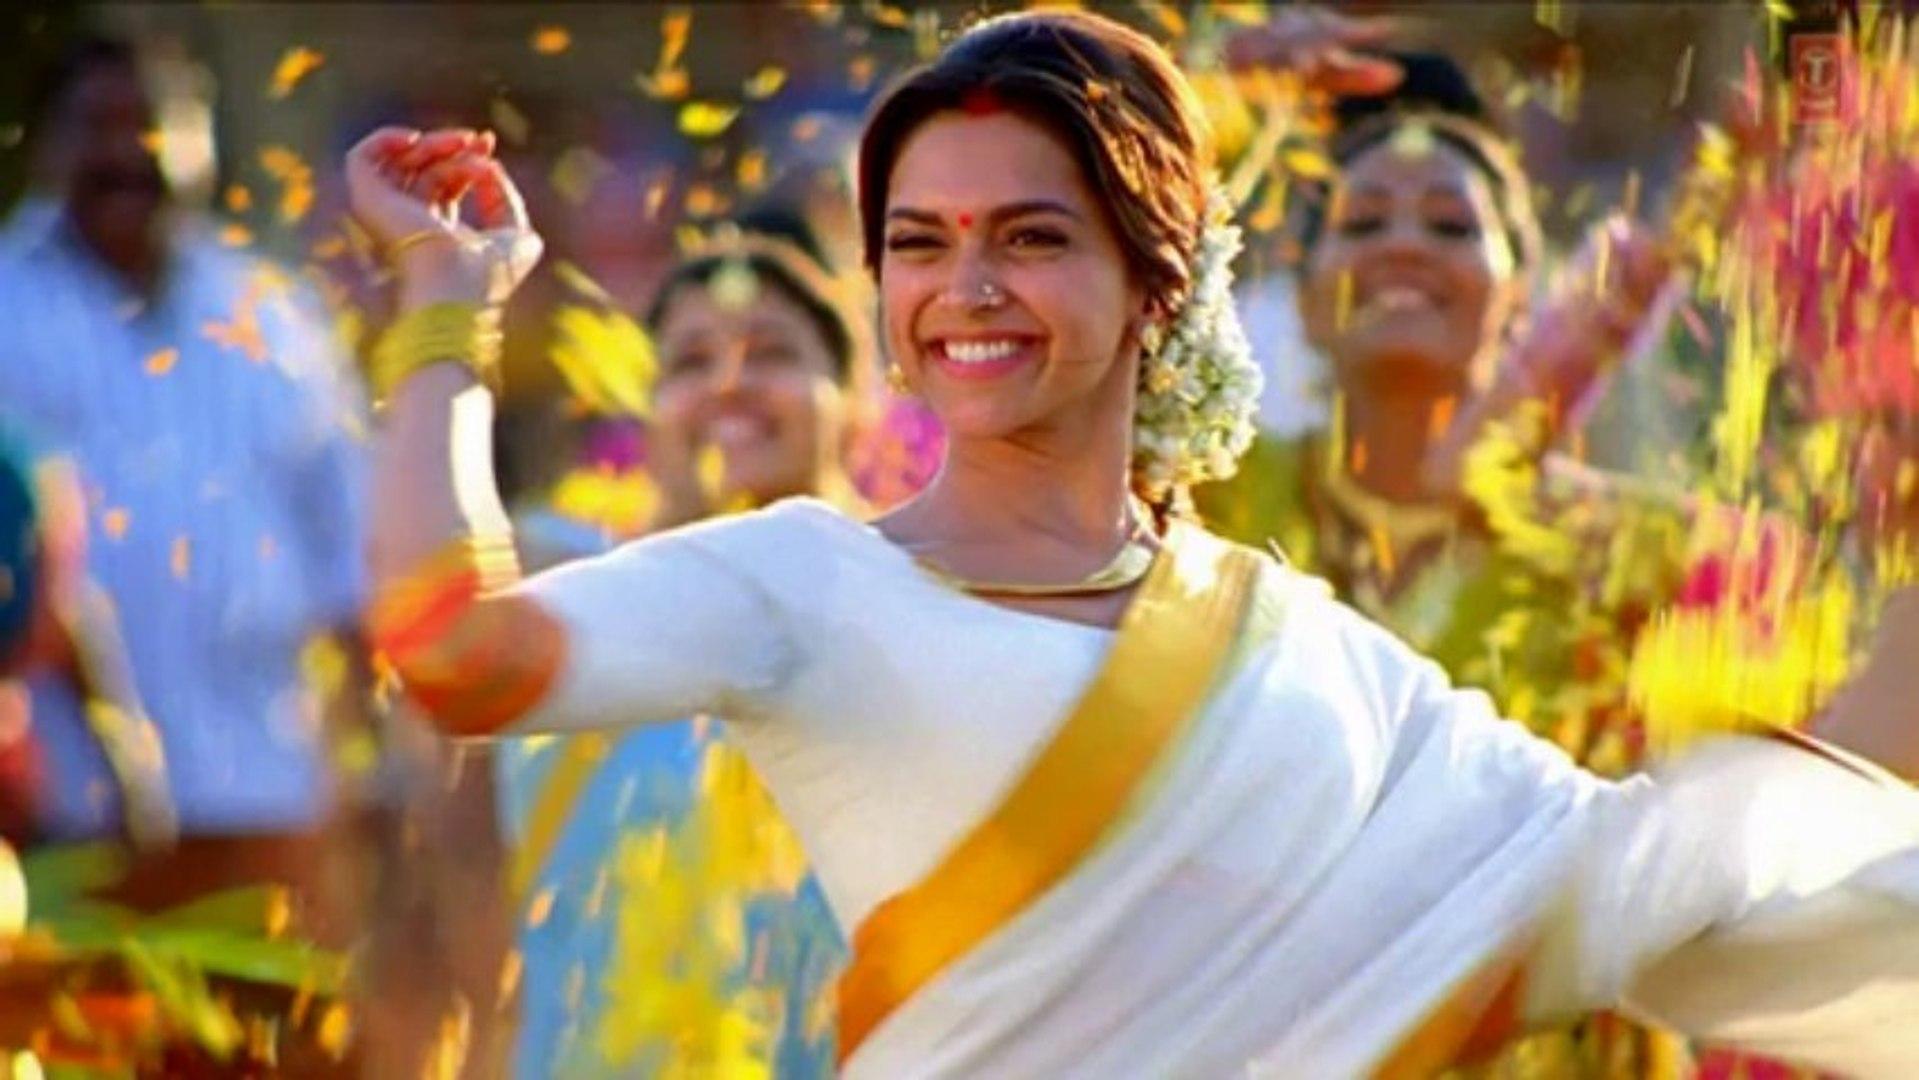 Titli Chennai Express Song With Lyrics _ Shahrukh Khan, Deepika Padukone - video Dailymotion